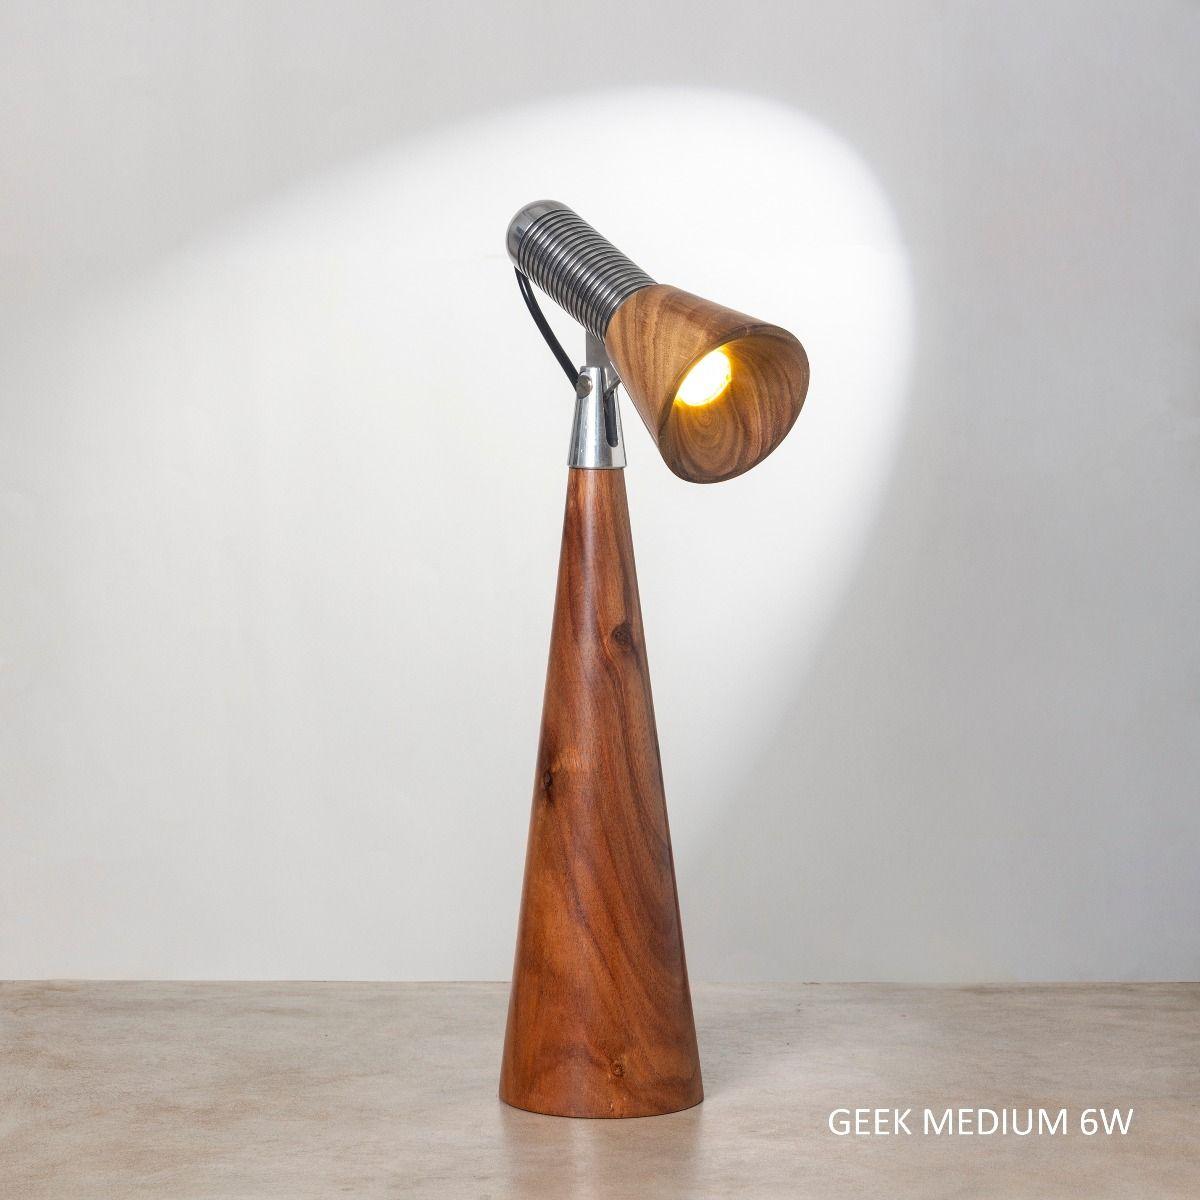 Geek M 6W Table Lamp